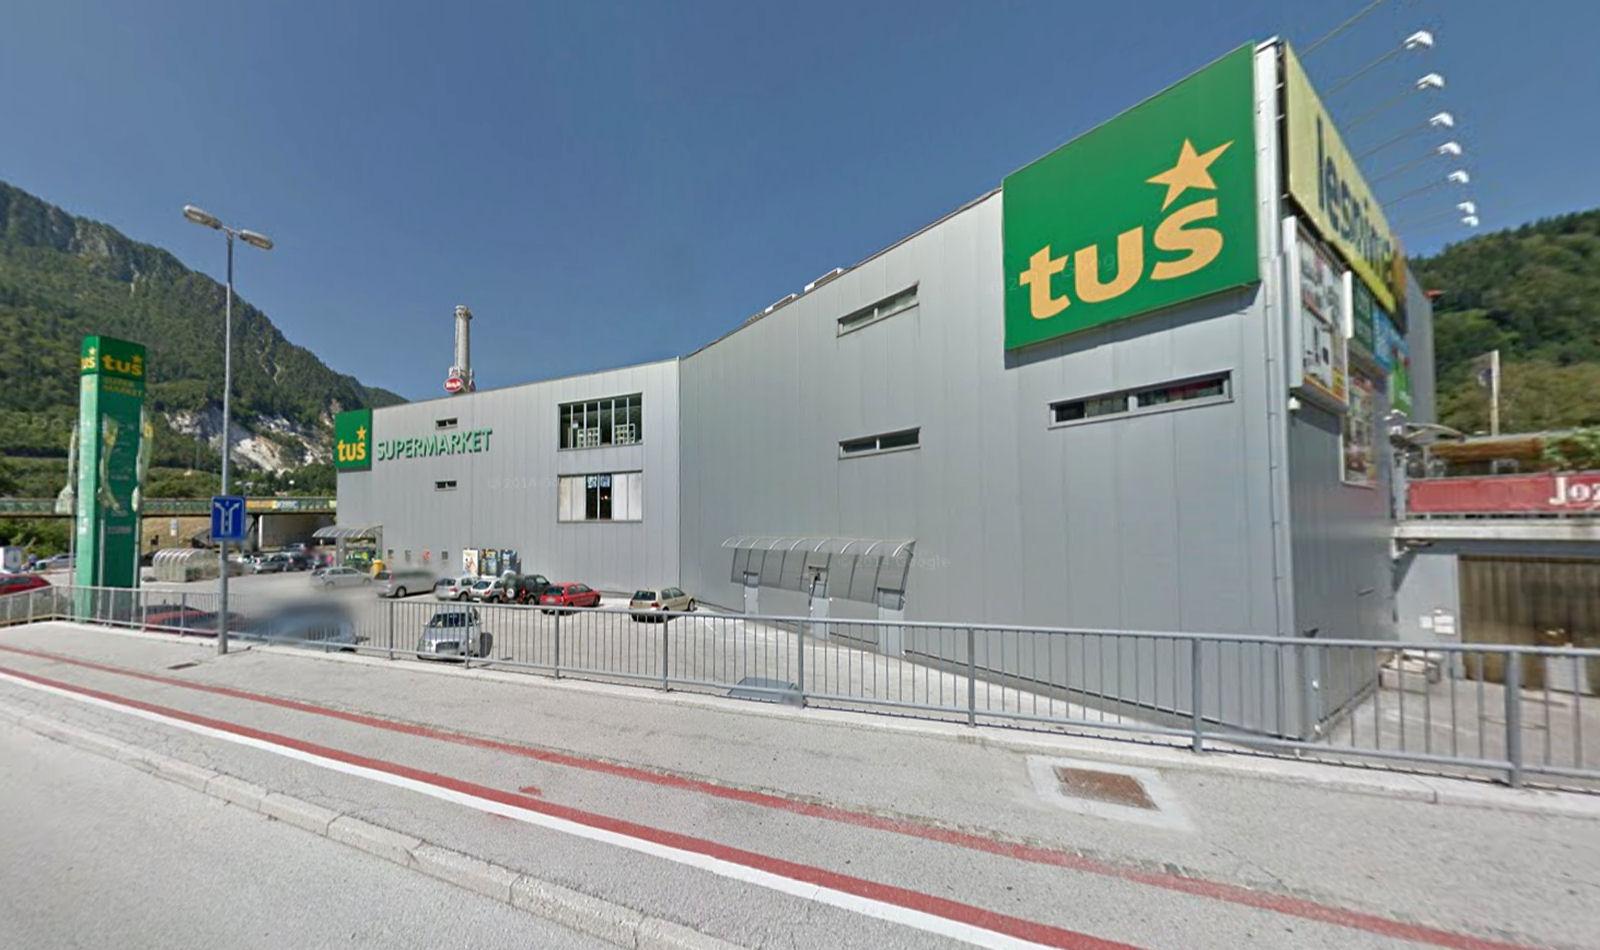 Tus Supermarket in Jesenice, Slovenia